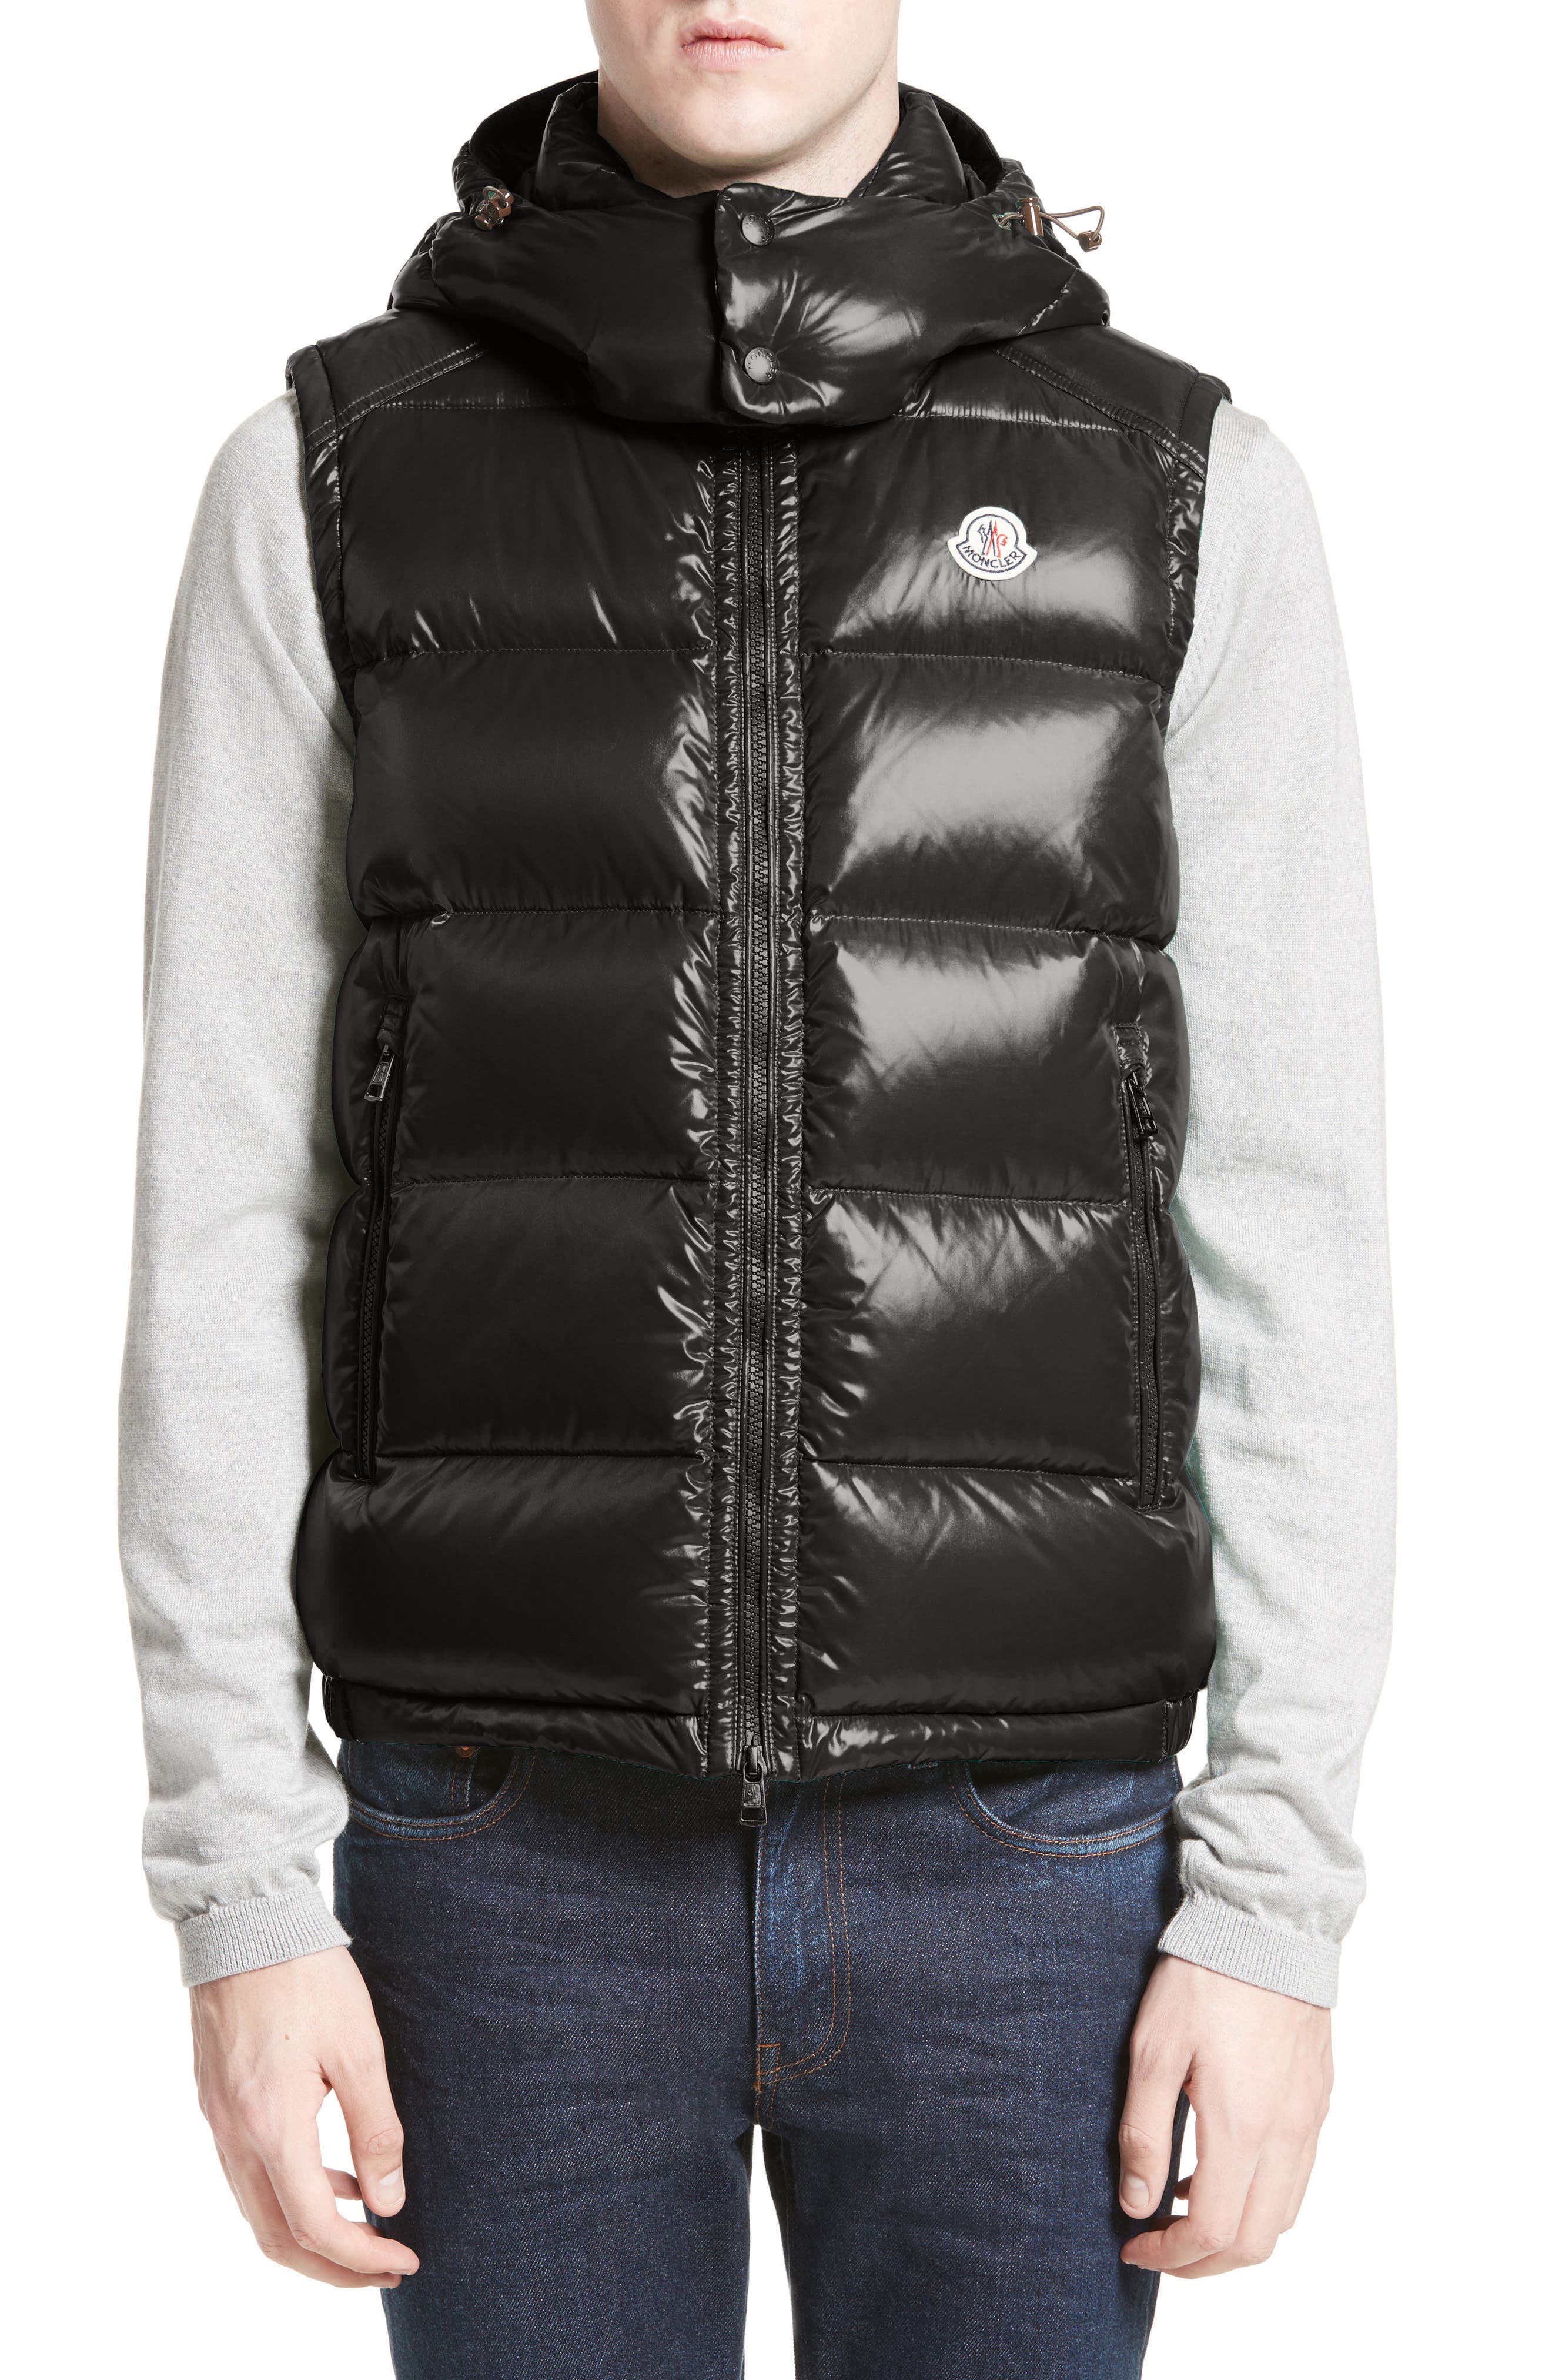 Lacet Lacquered Hooded Down Vest,                             Main thumbnail 1, color,                             BLACK